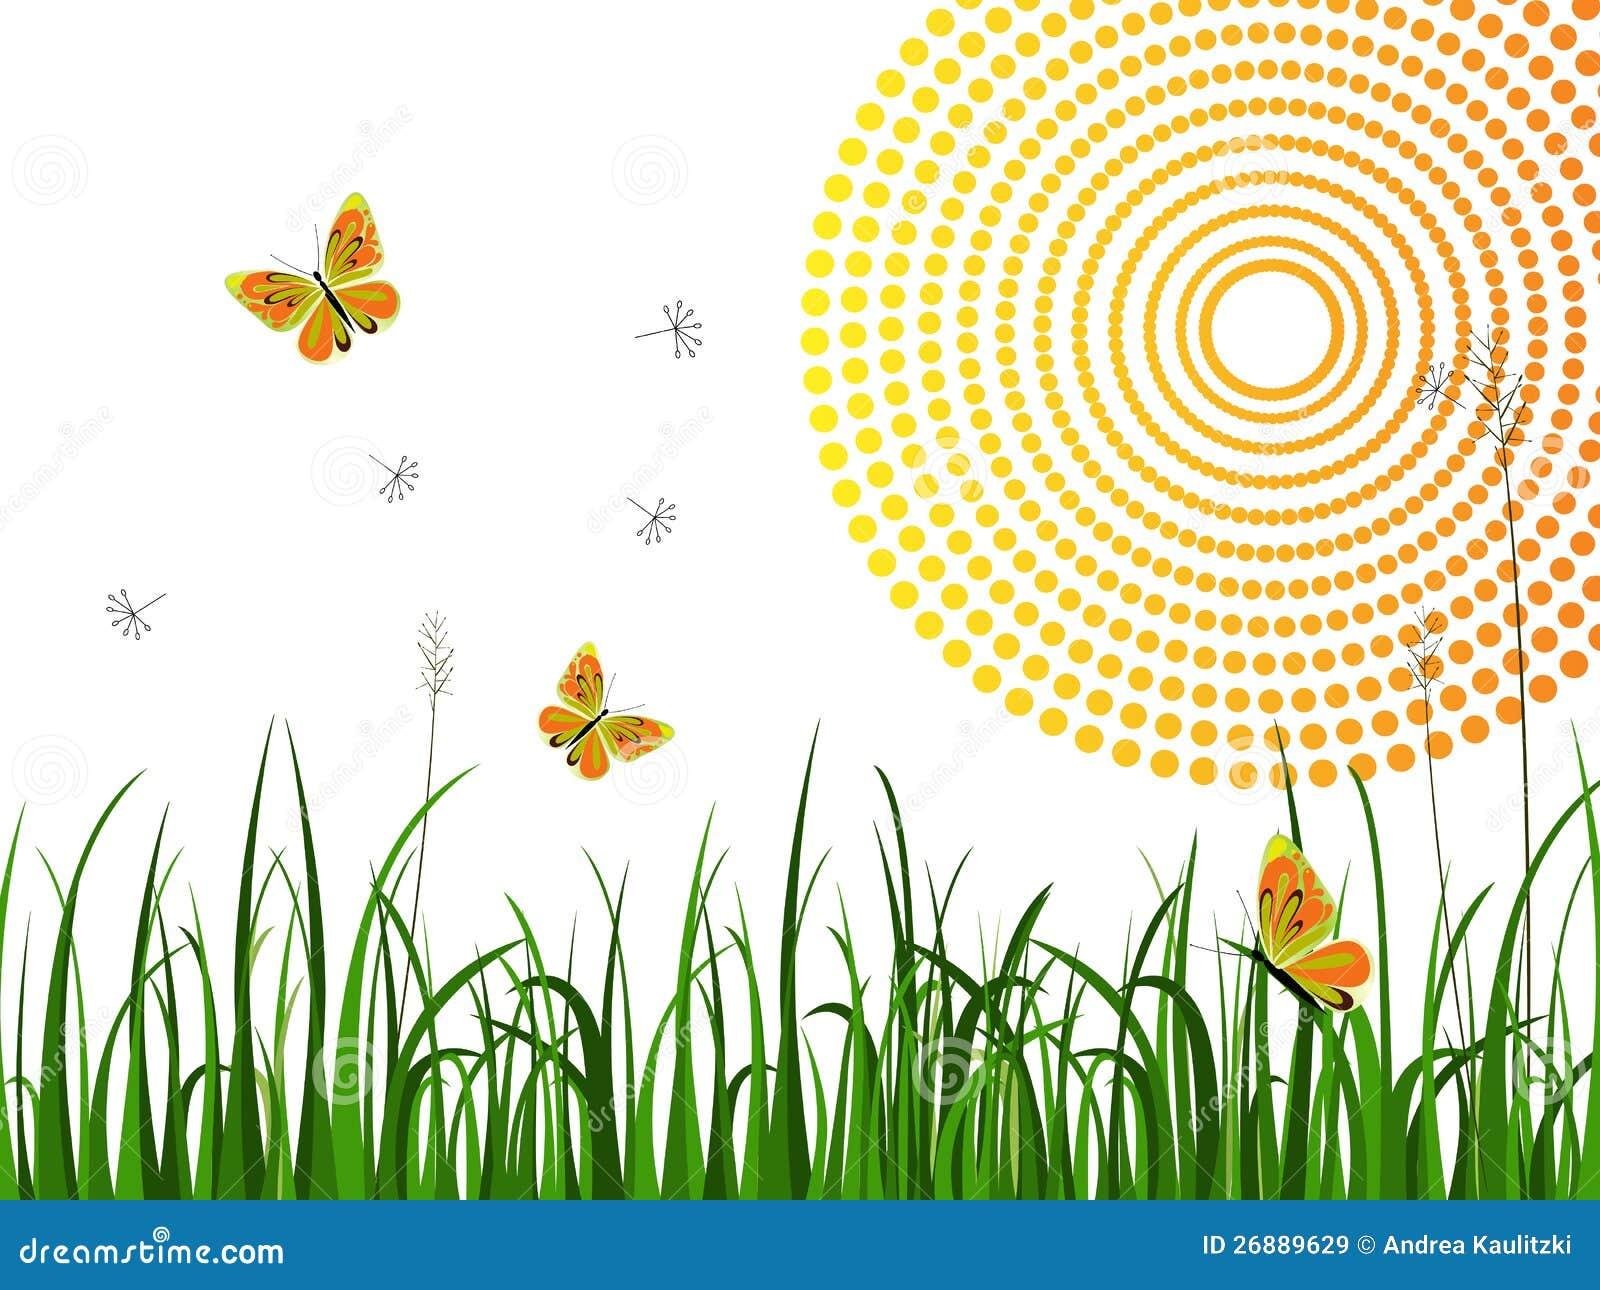 nature design stock illustration illustration of illustration